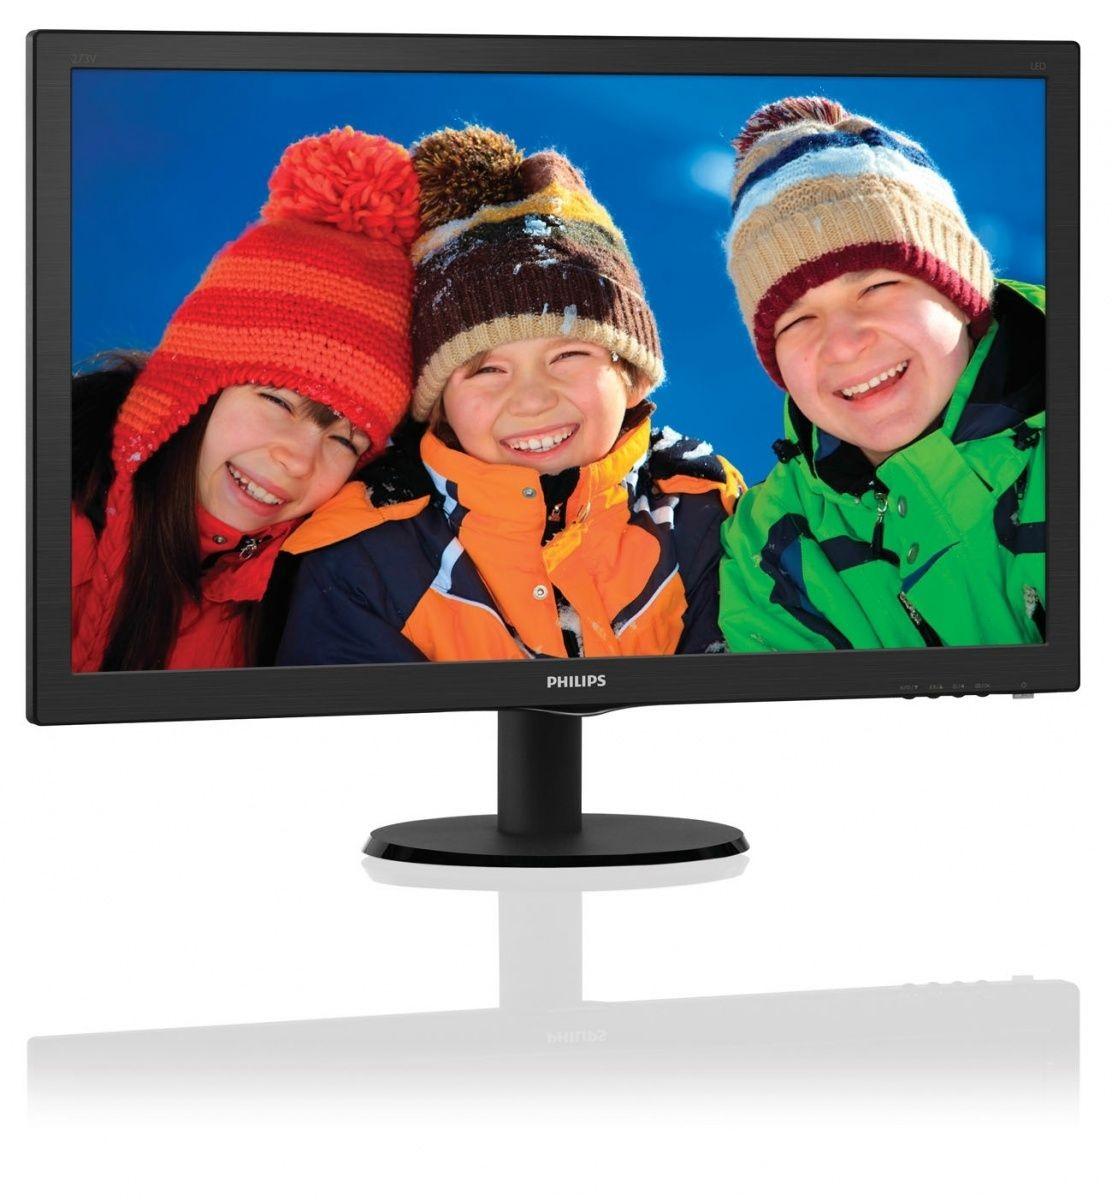 Philips Monitor 273V5LHSB/00 27'', D-Sub/HDMI